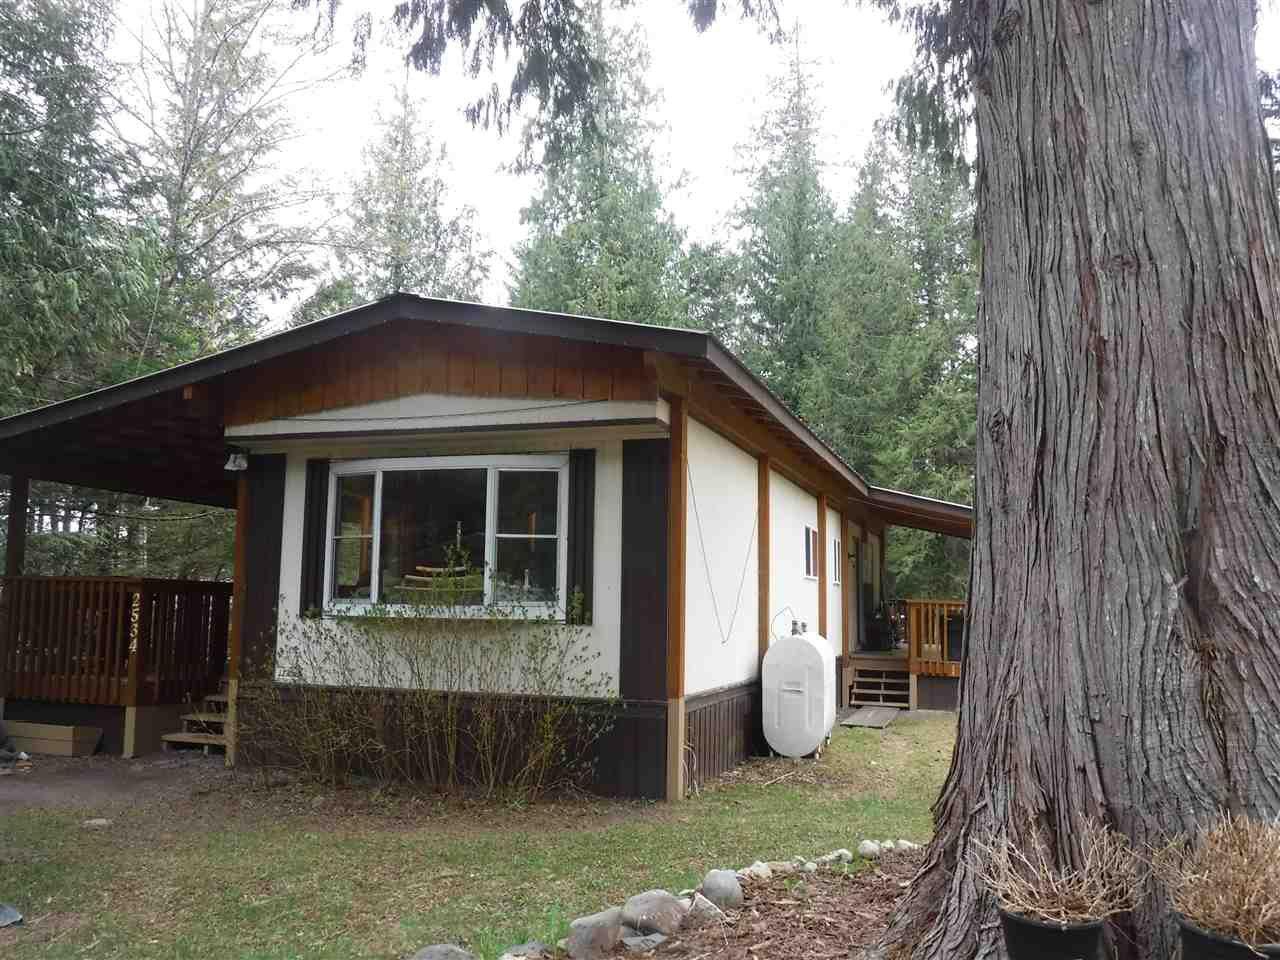 Main Photo: 2534 N N DOUGLAS Drive in Bella Coola: Bella Coola/Hagensborg Manufactured Home for sale (Williams Lake (Zone 27))  : MLS®# R2452013